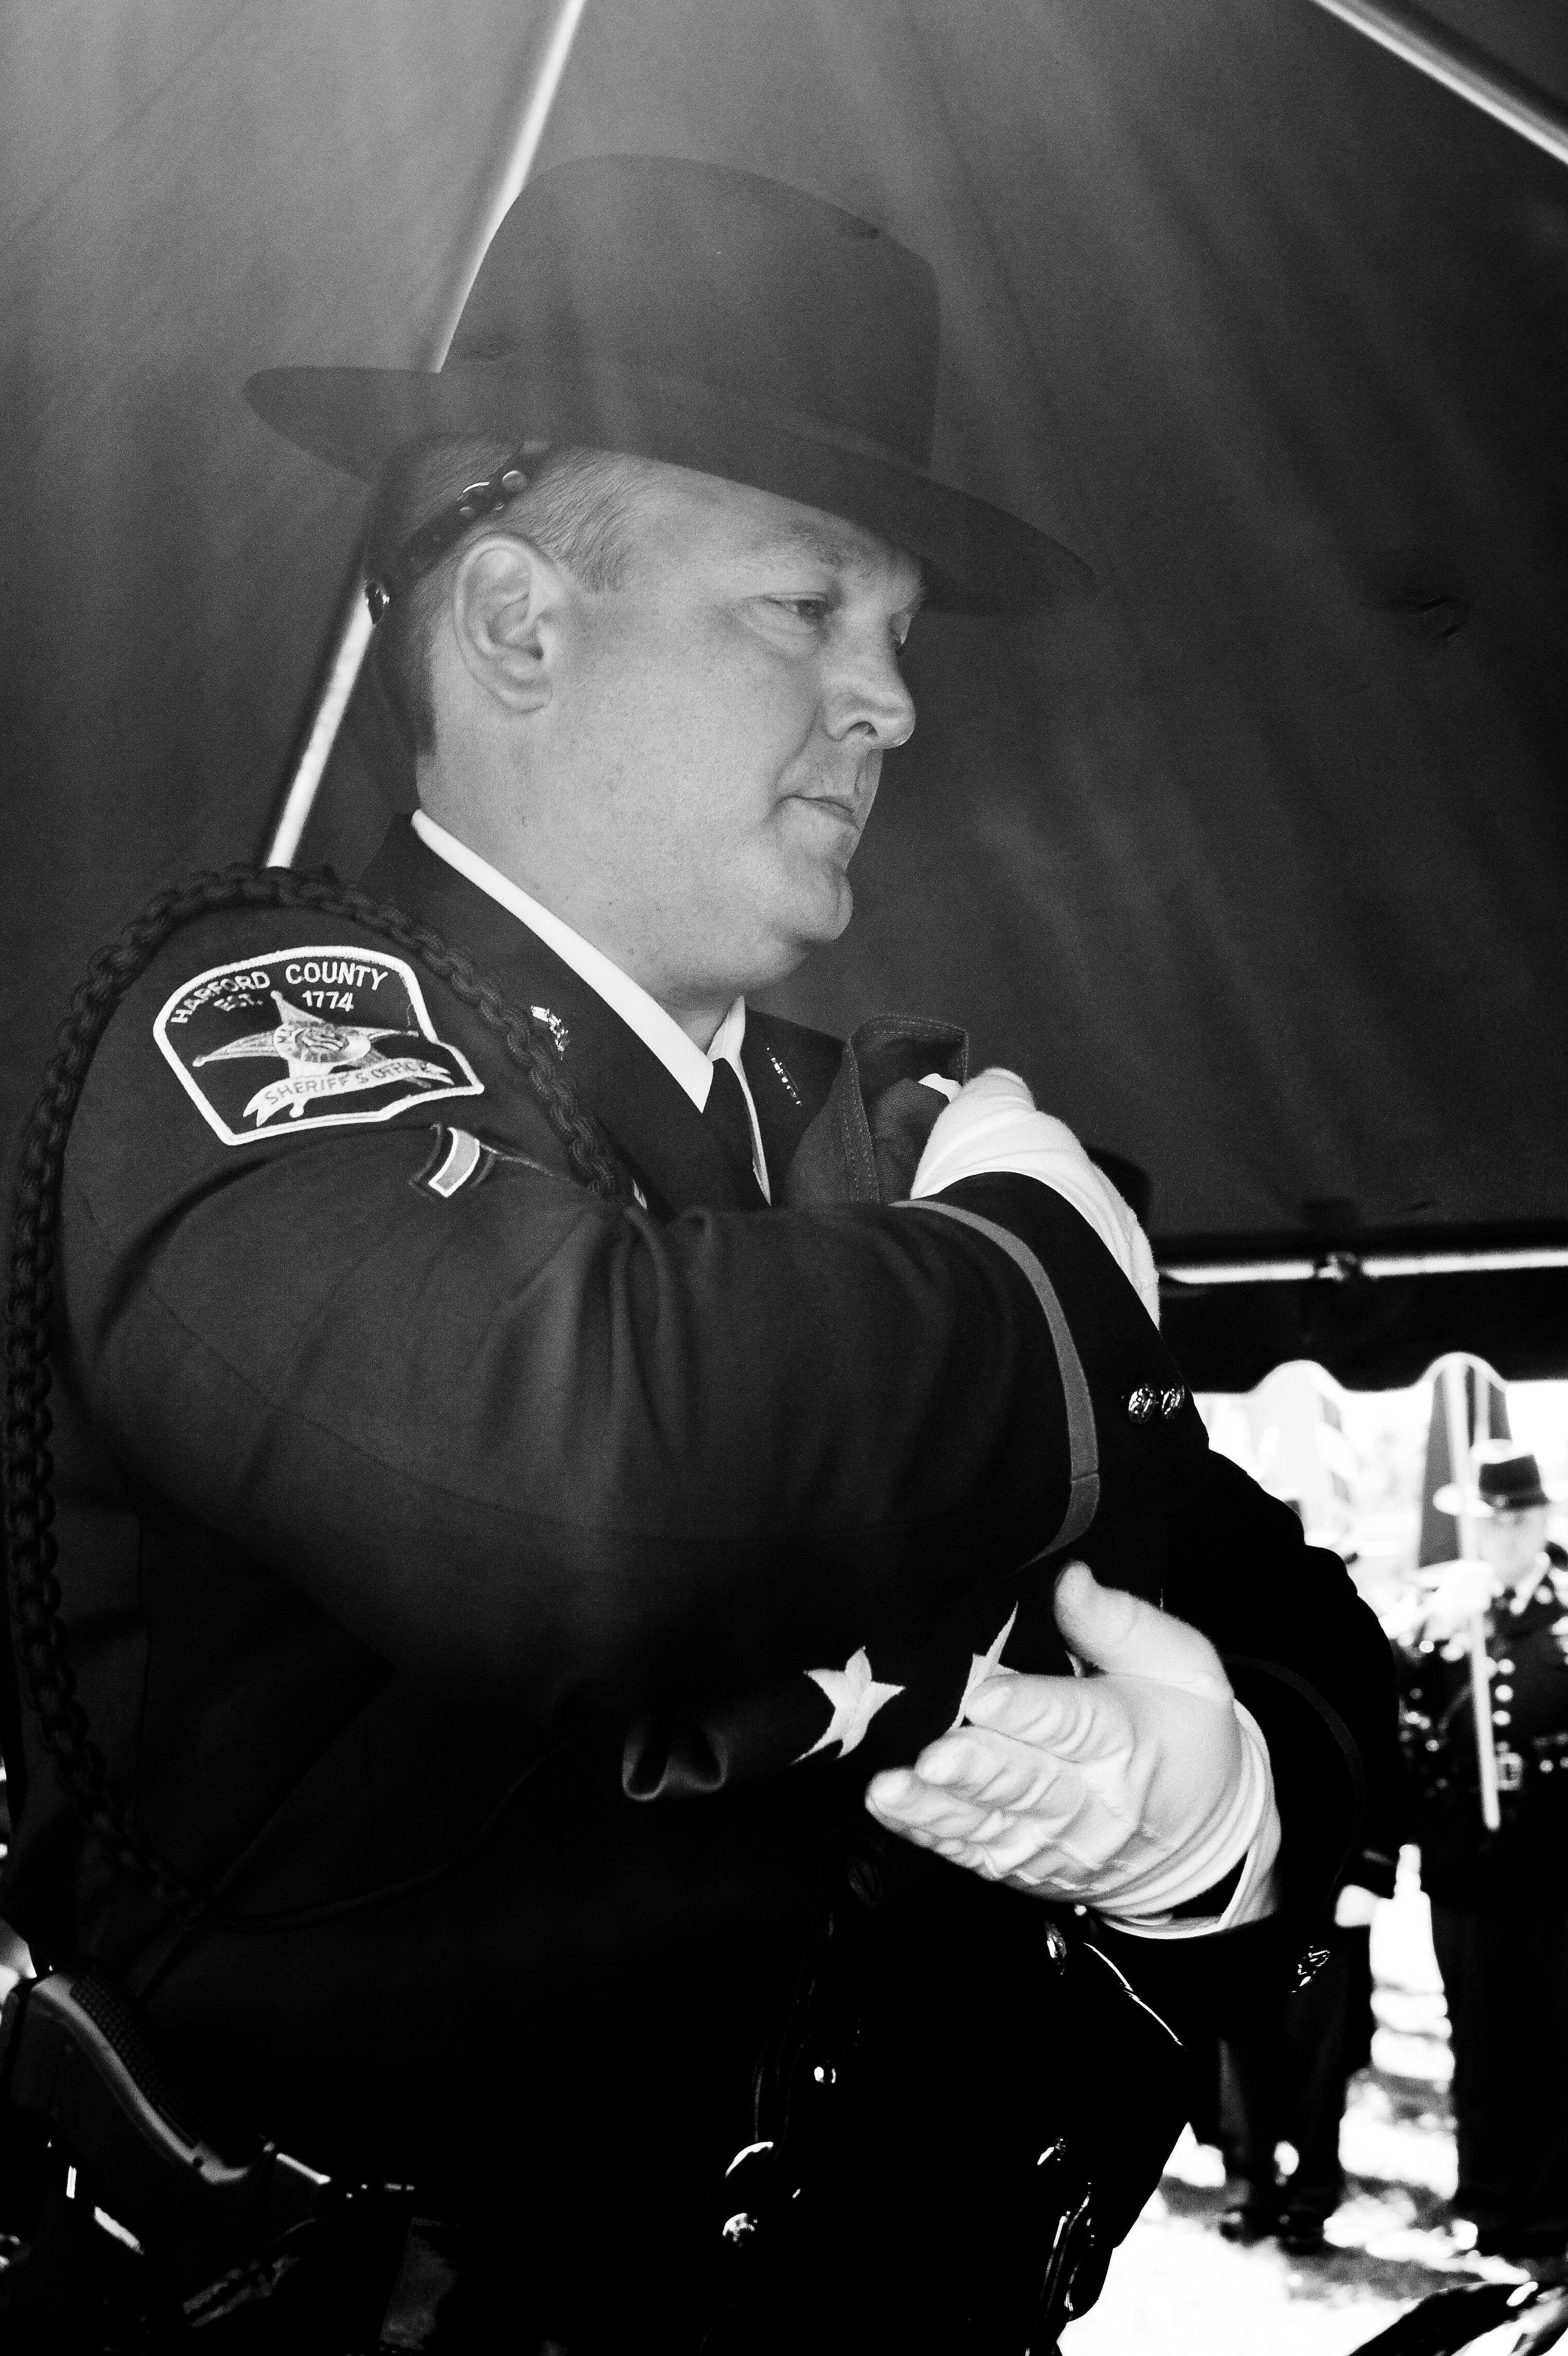 SR. DFC Mark F. Logsdon